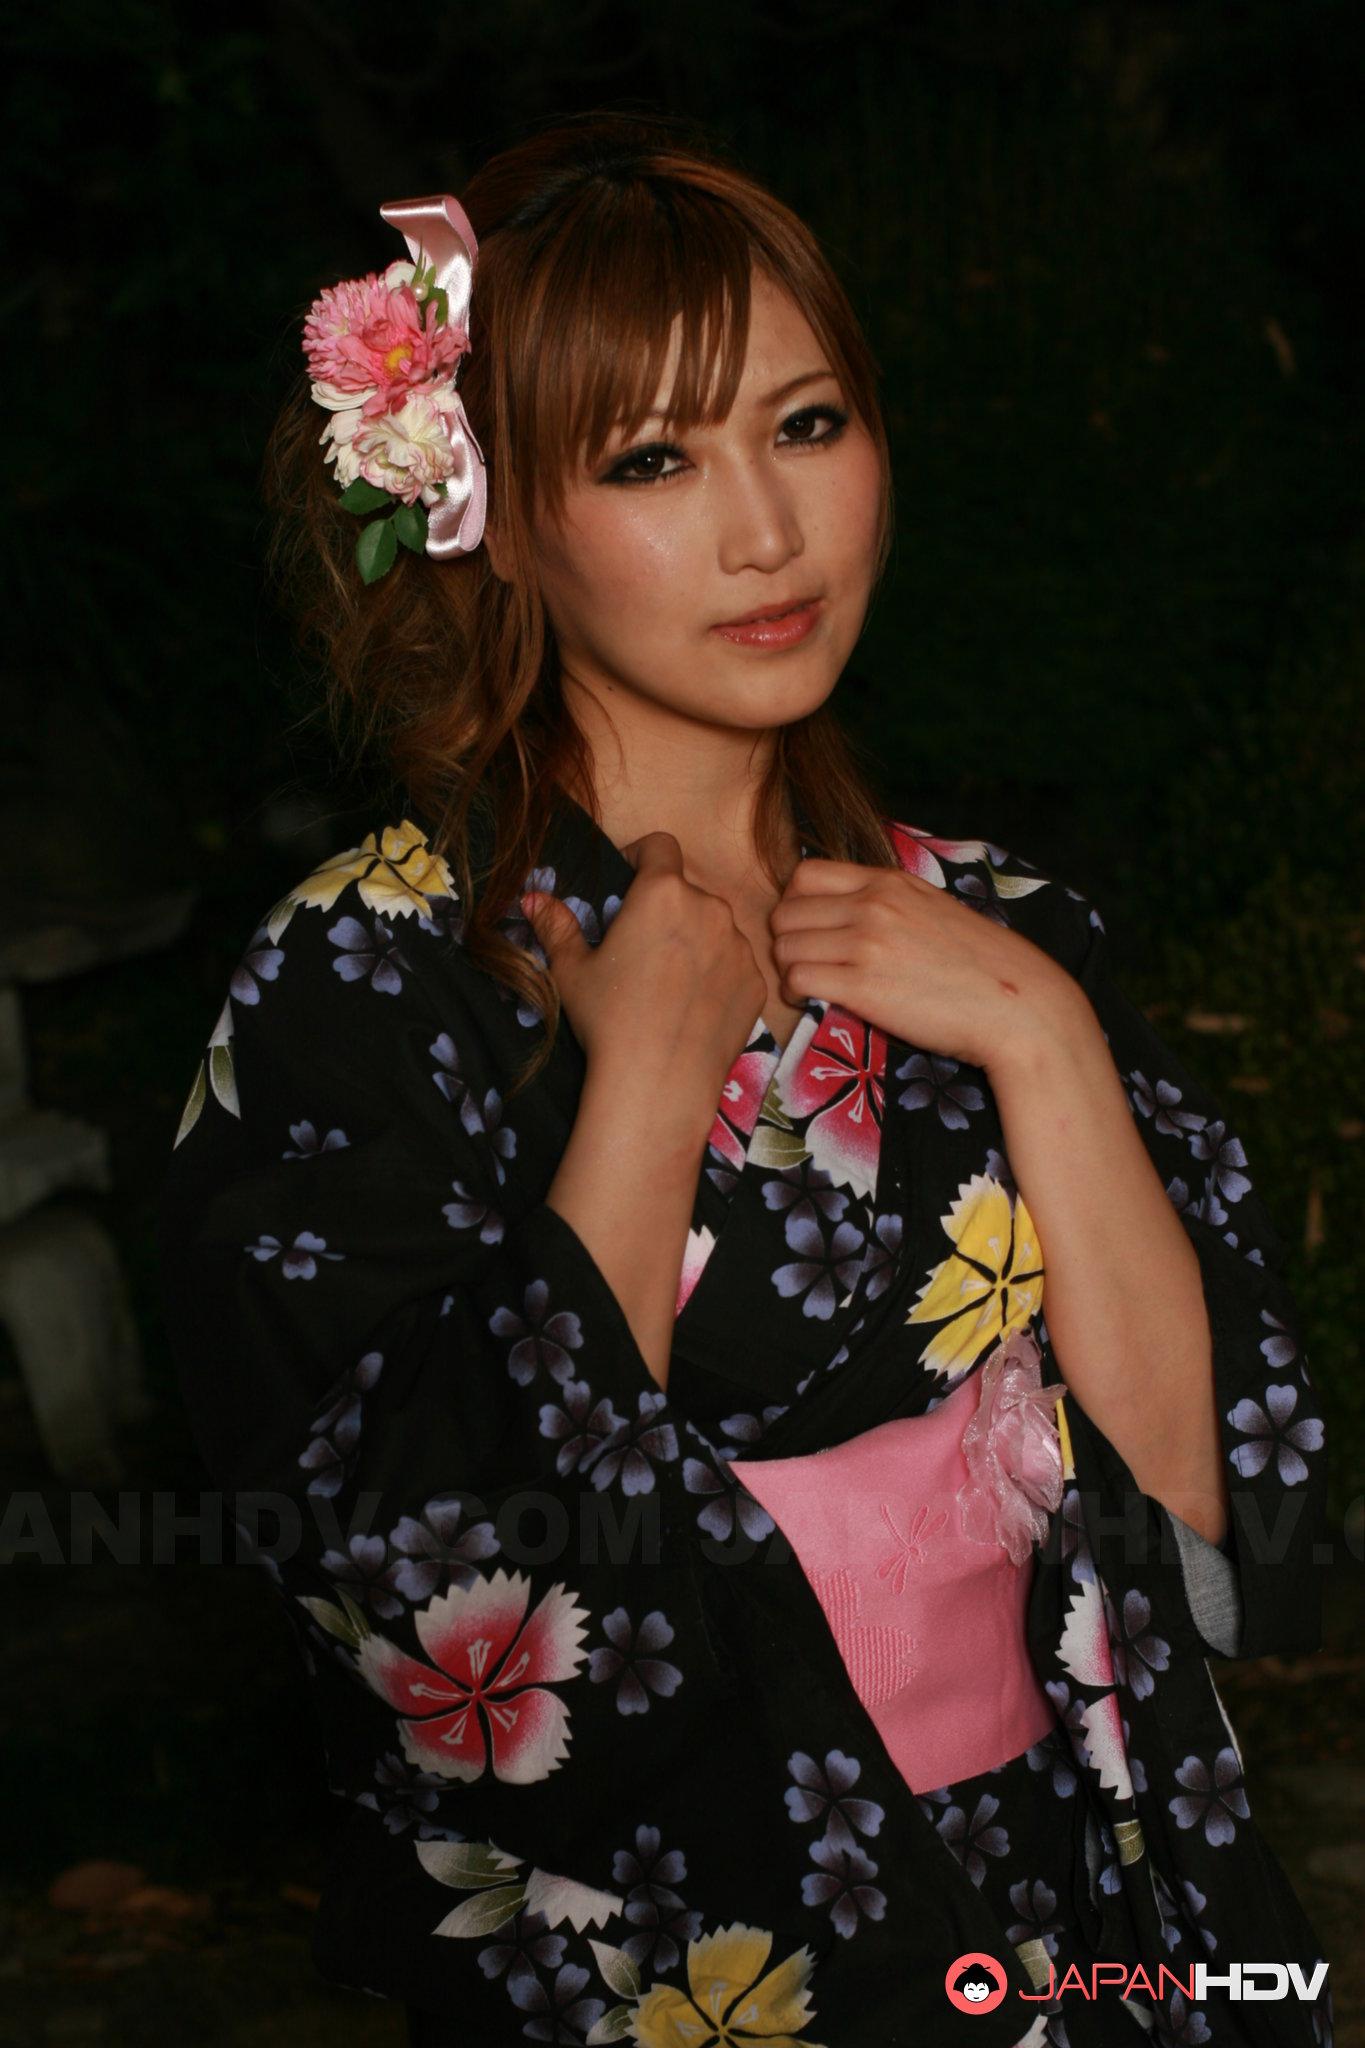 Hot Japanese lady in kimono Eri Hoshikawa